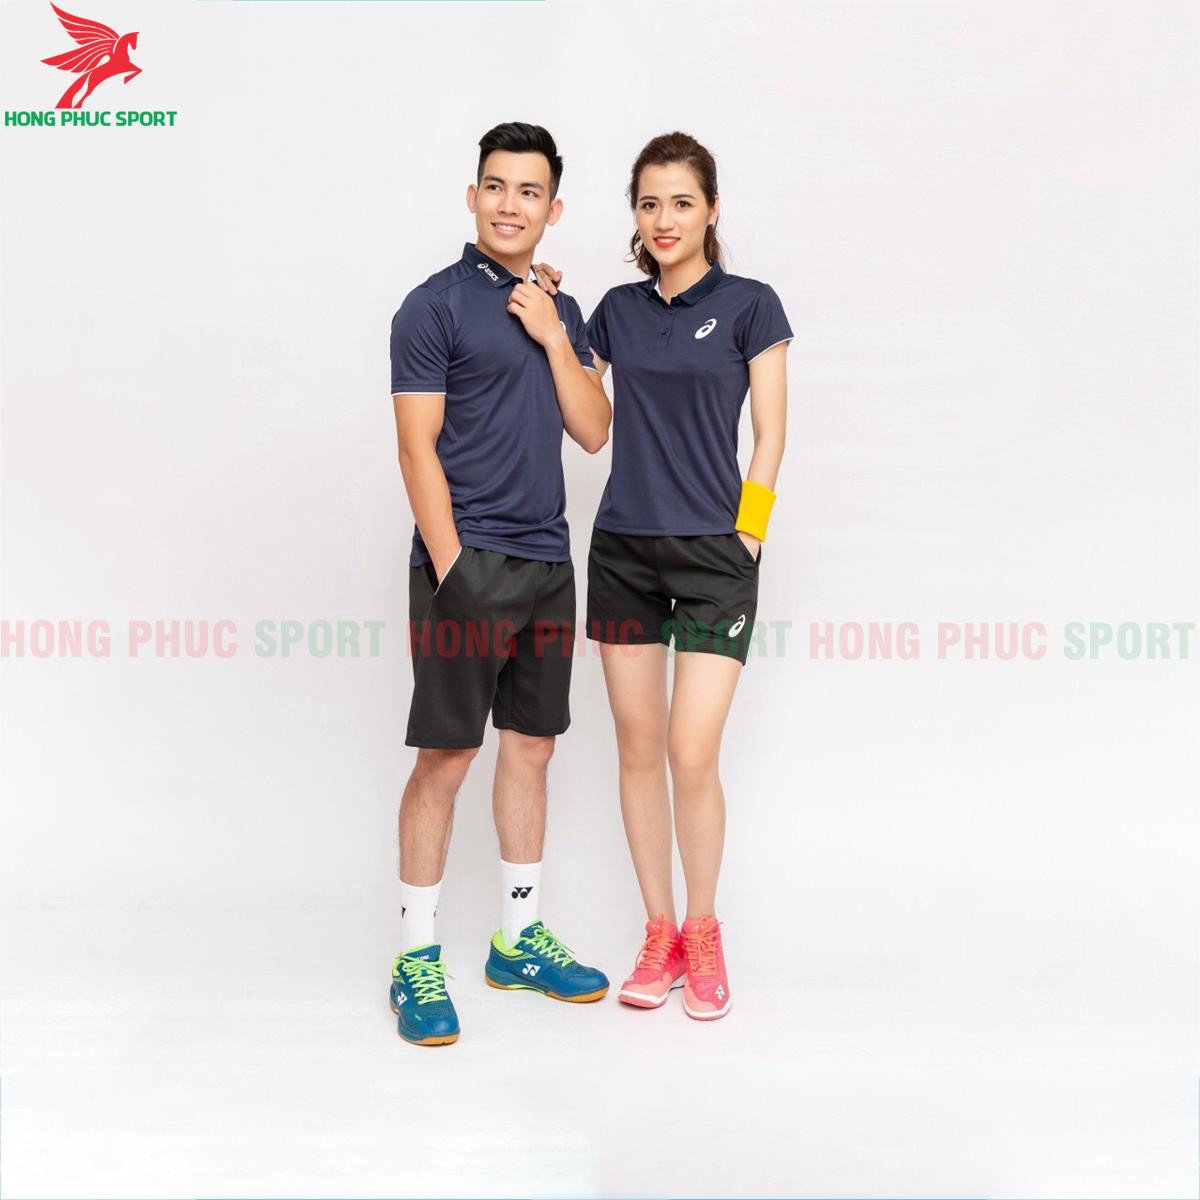 https://cdn.hongphucsport.com/unsafe/s4.shopbay.vn/files/285/ao-tennis-asic-2020-mau-xanh-dam-5f76f077e4964.png